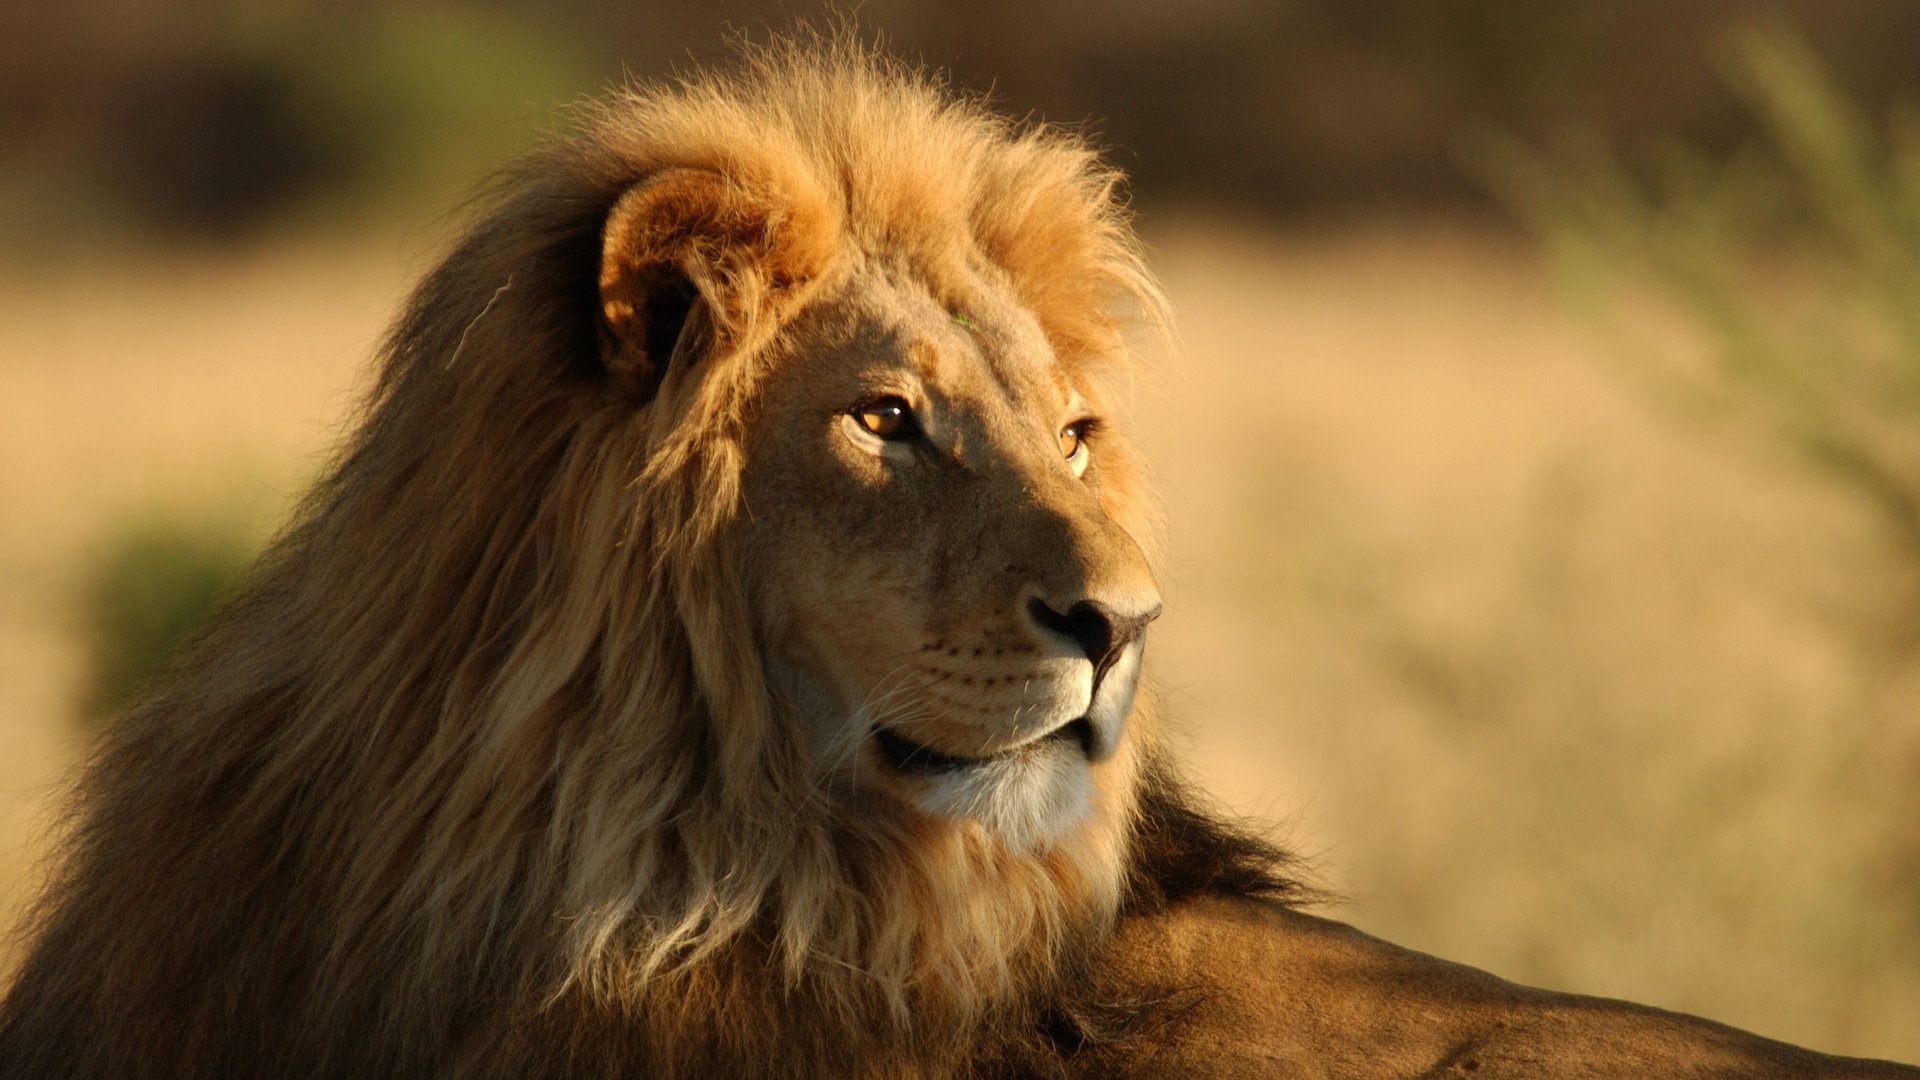 download wallpaper 1920x1080 lion, face, mane, coat, profile full hd